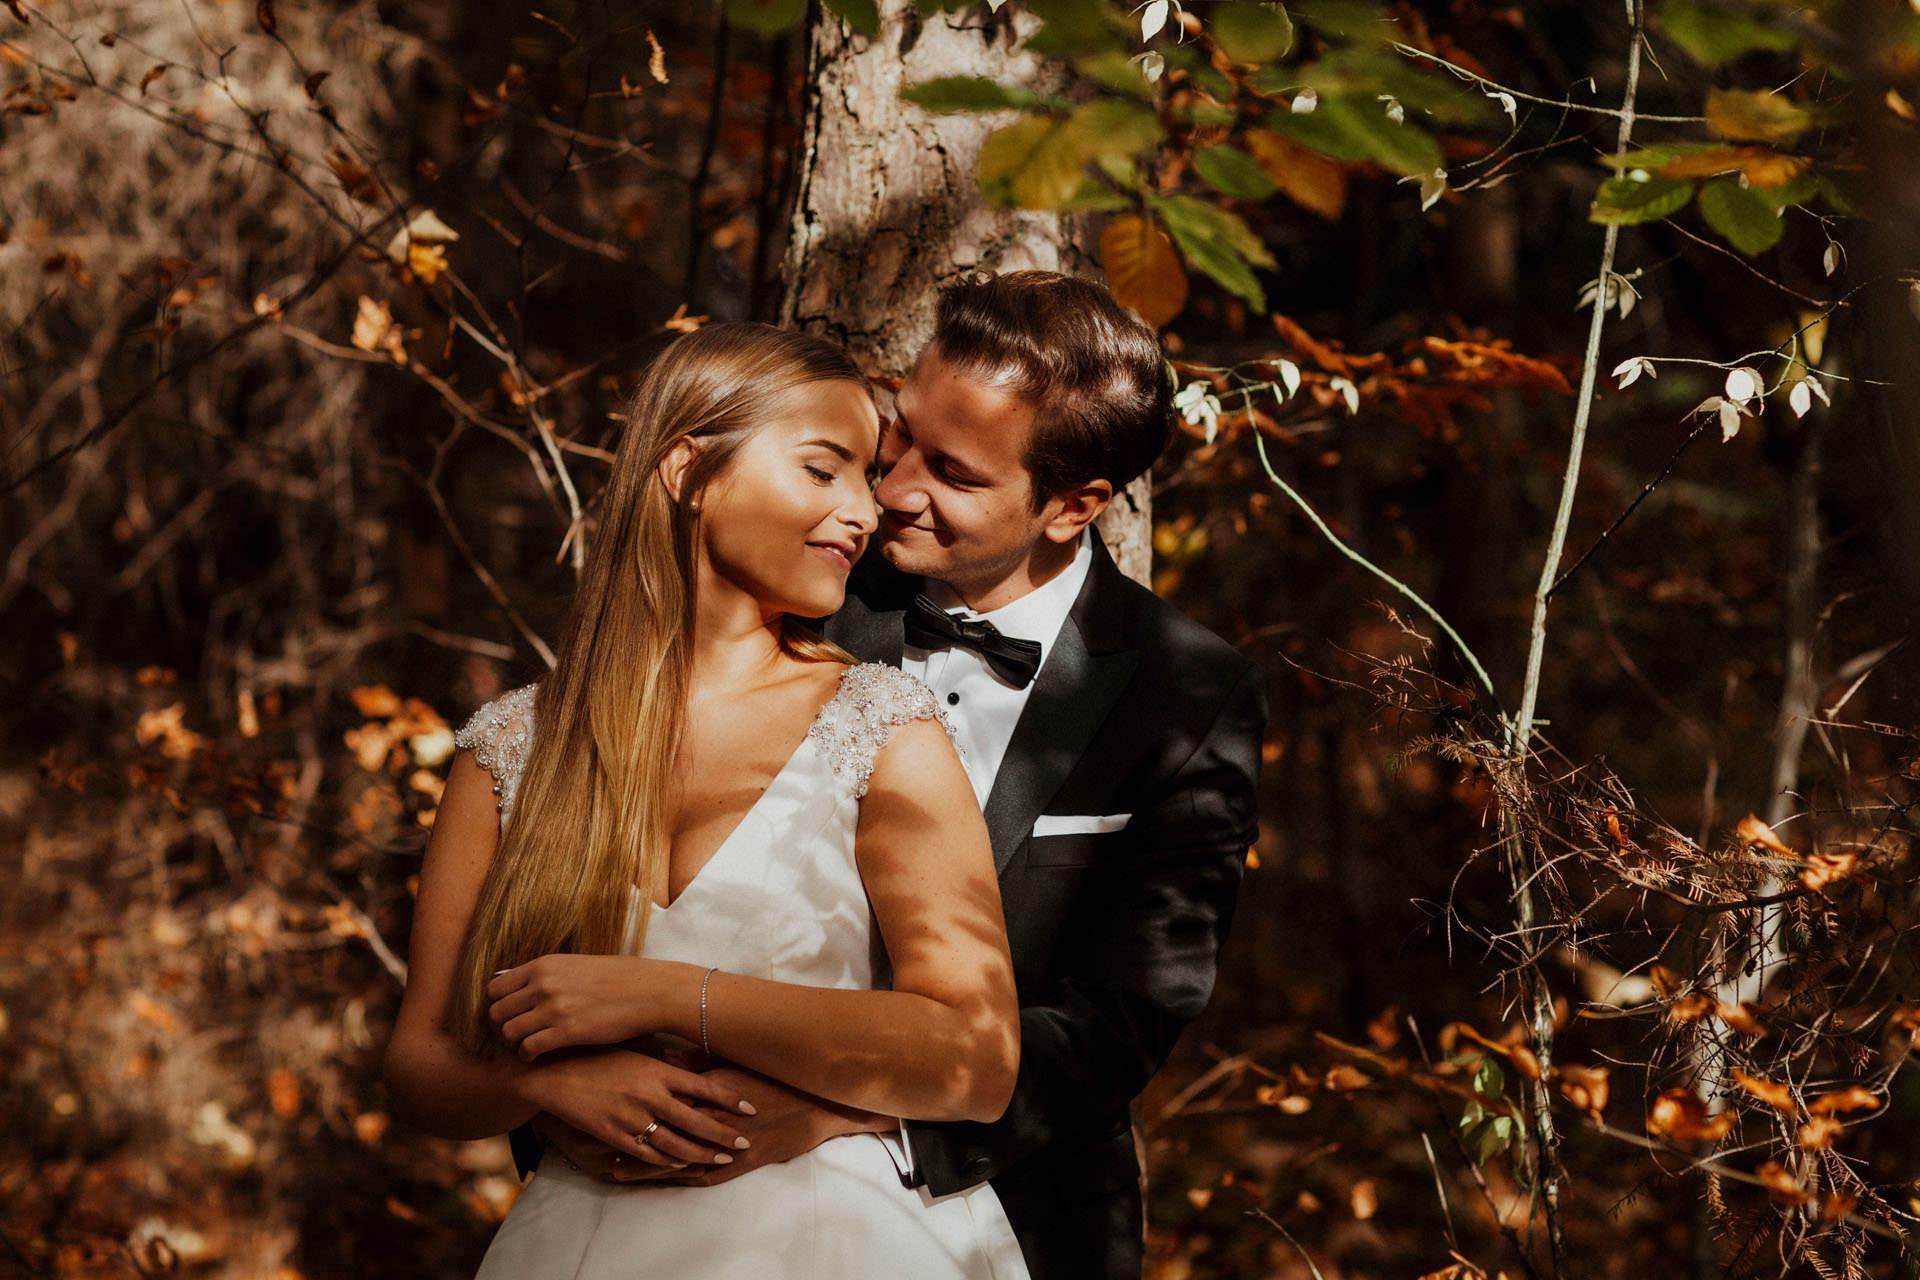 Patrycja i Patryk wesele stara zajezdnia 0050